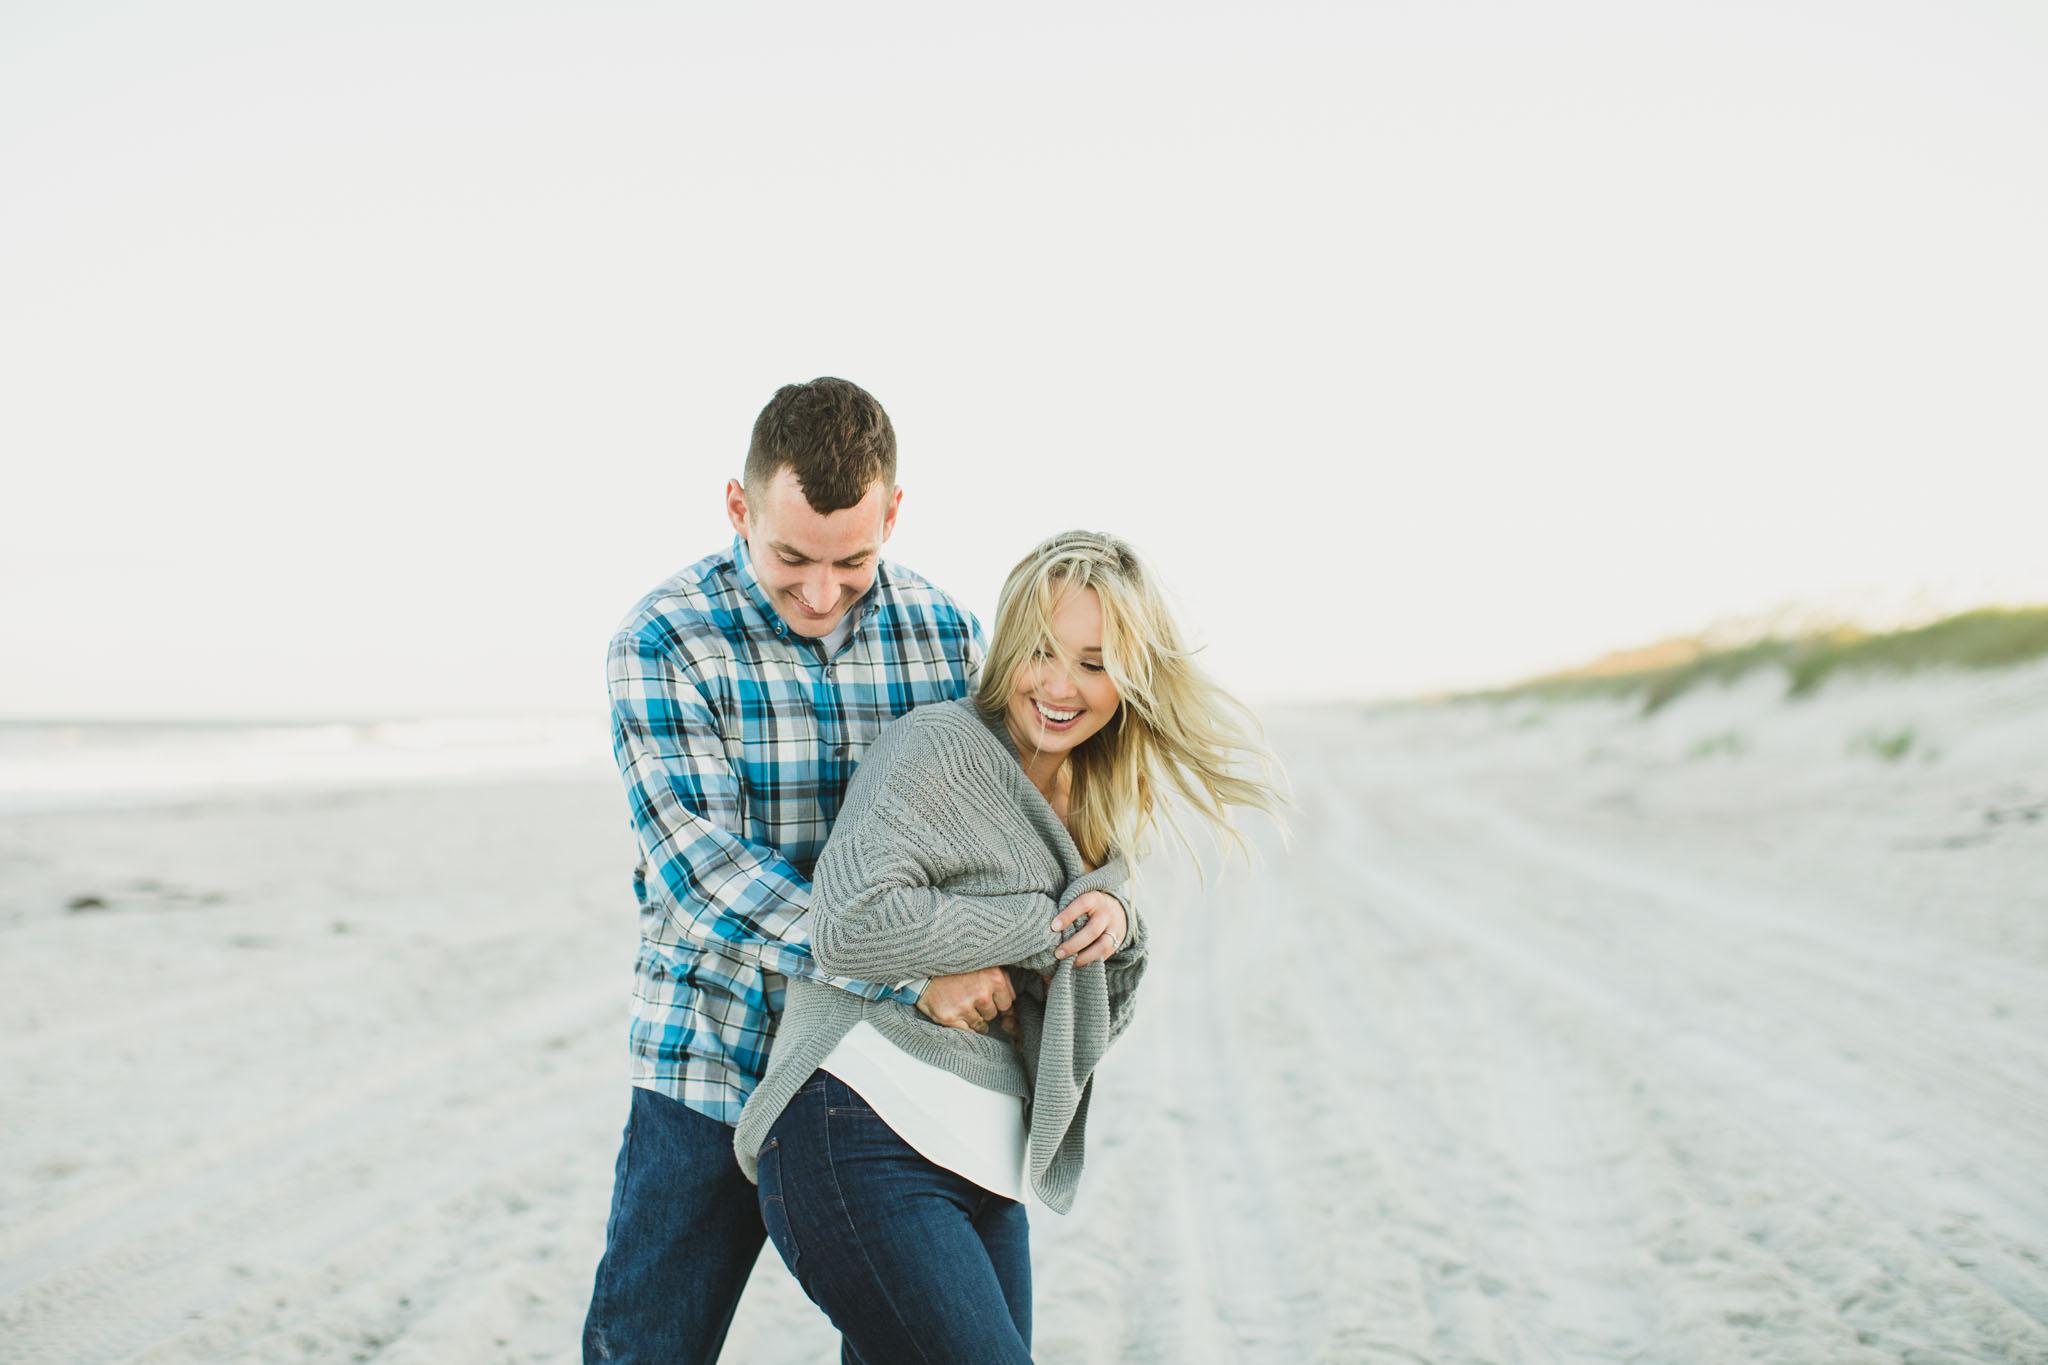 man hugging woman from behind at beach